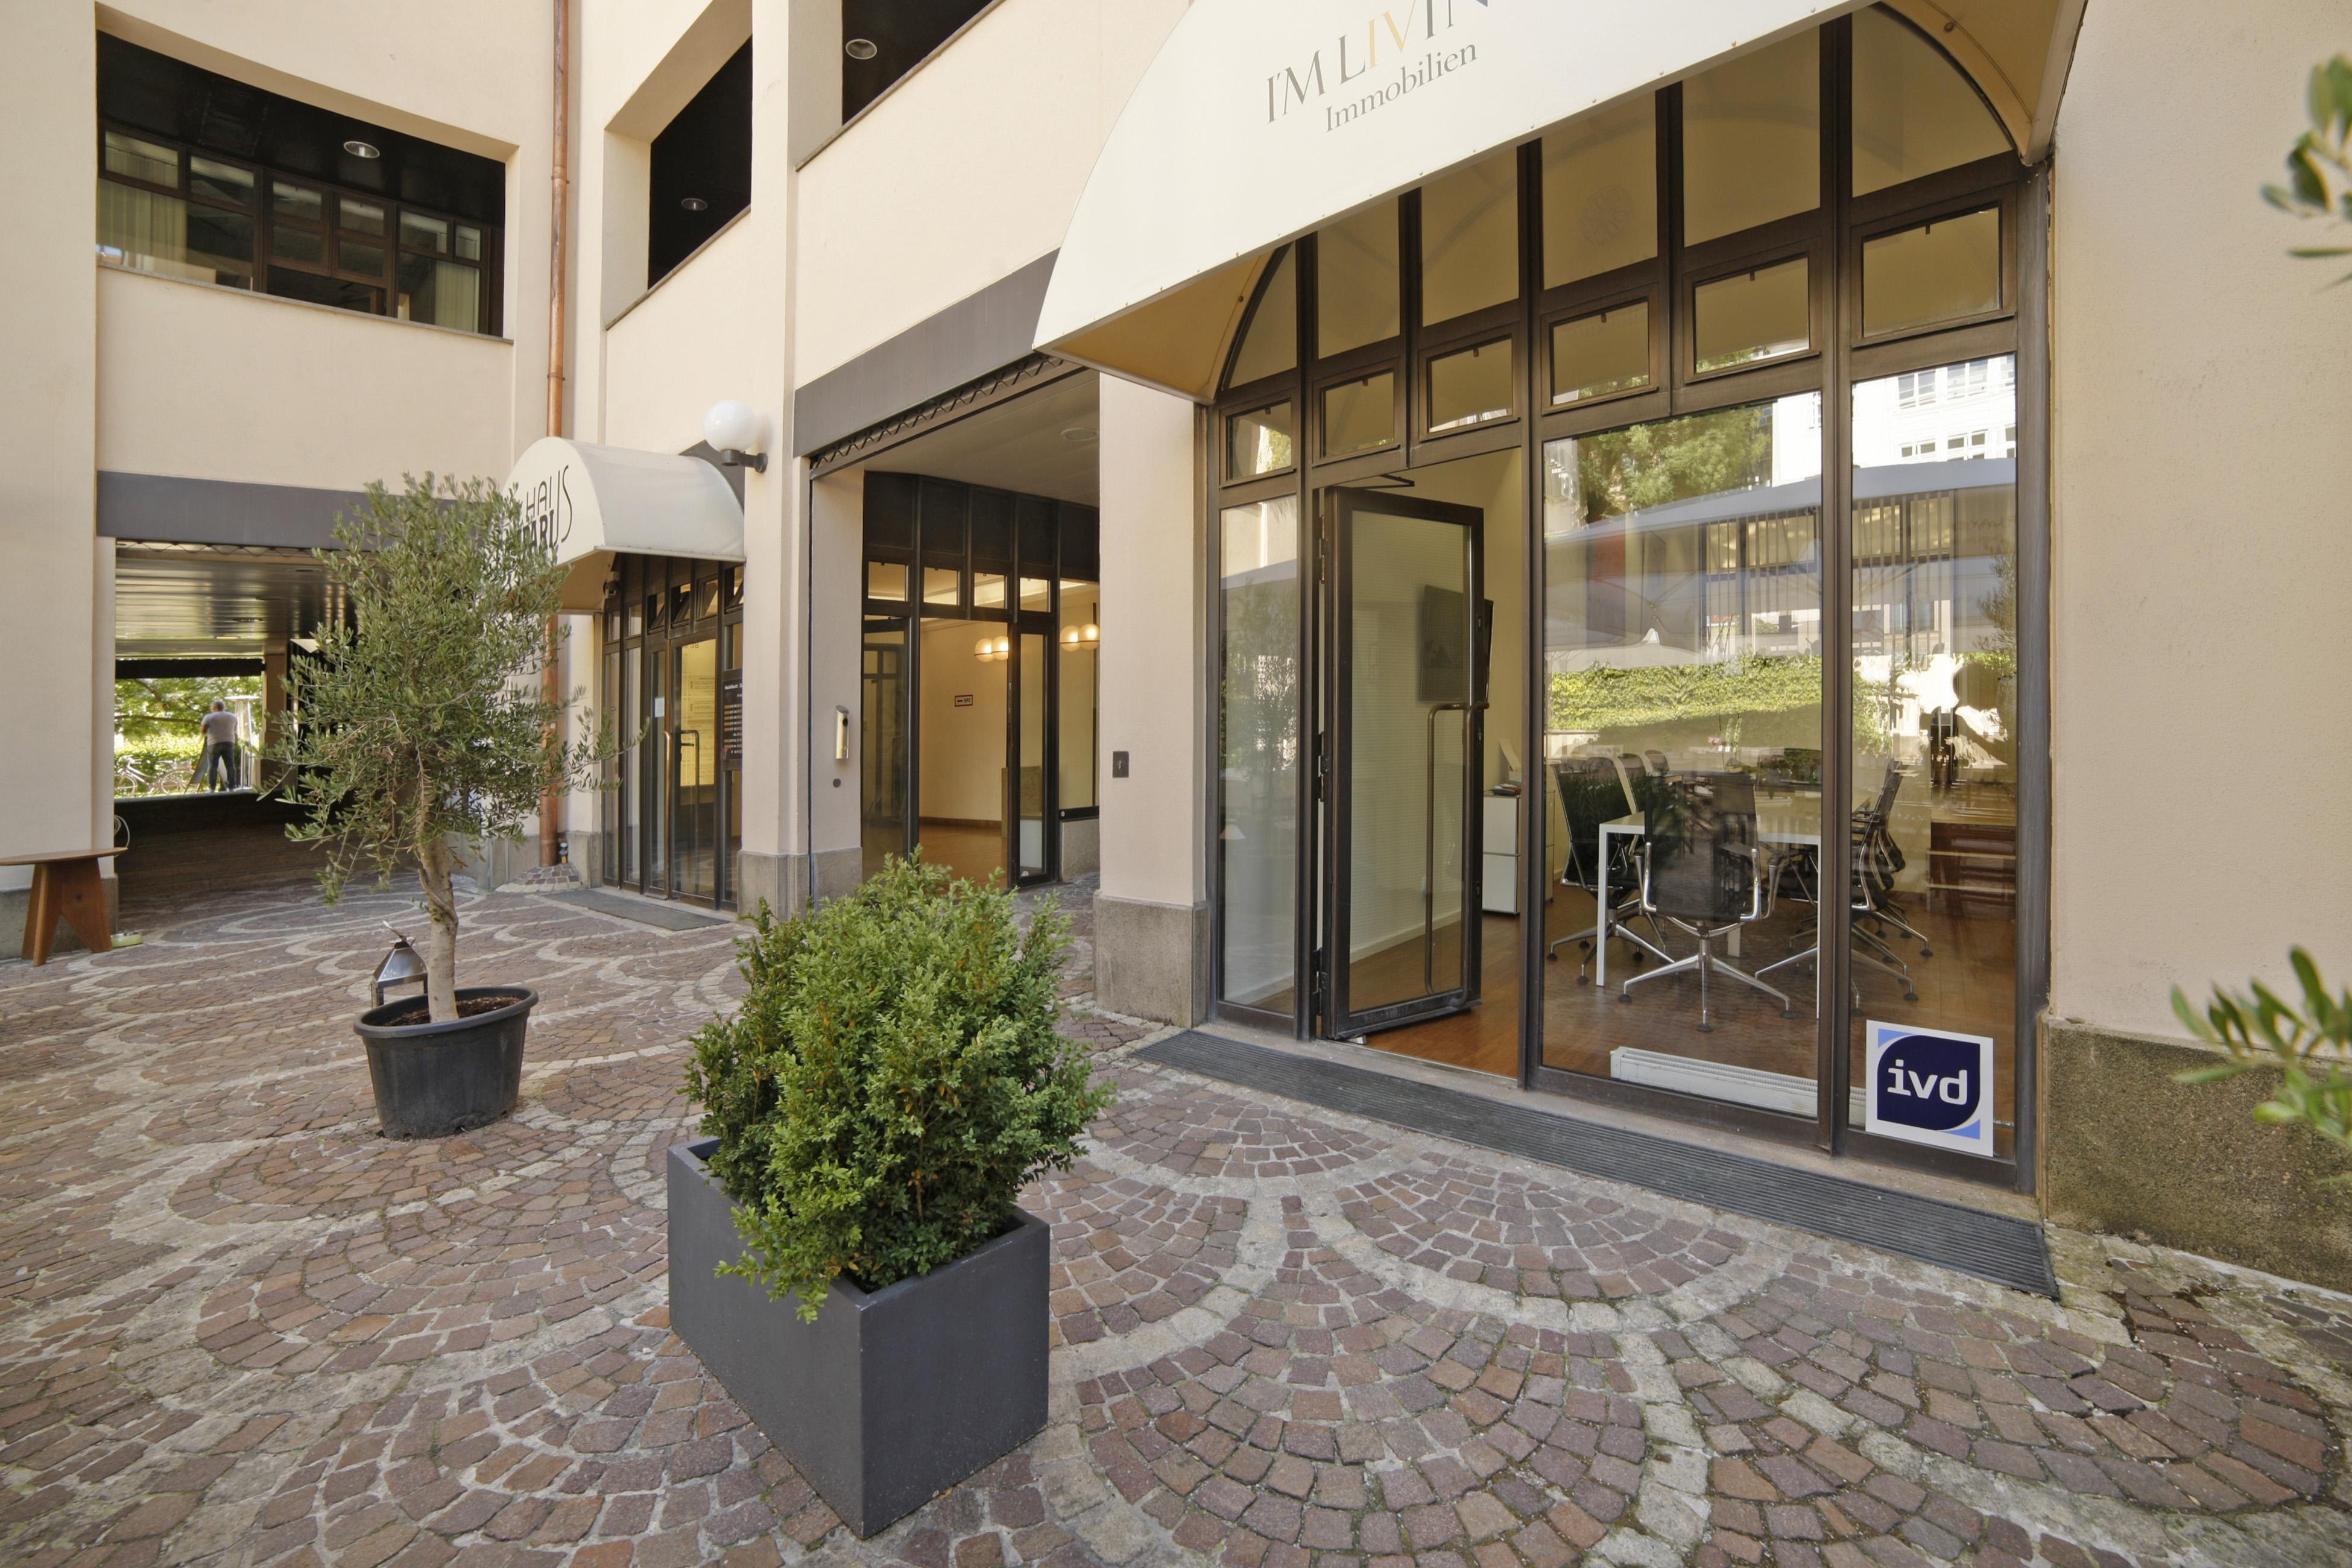 I'M LIVING Immobilien Büro in München